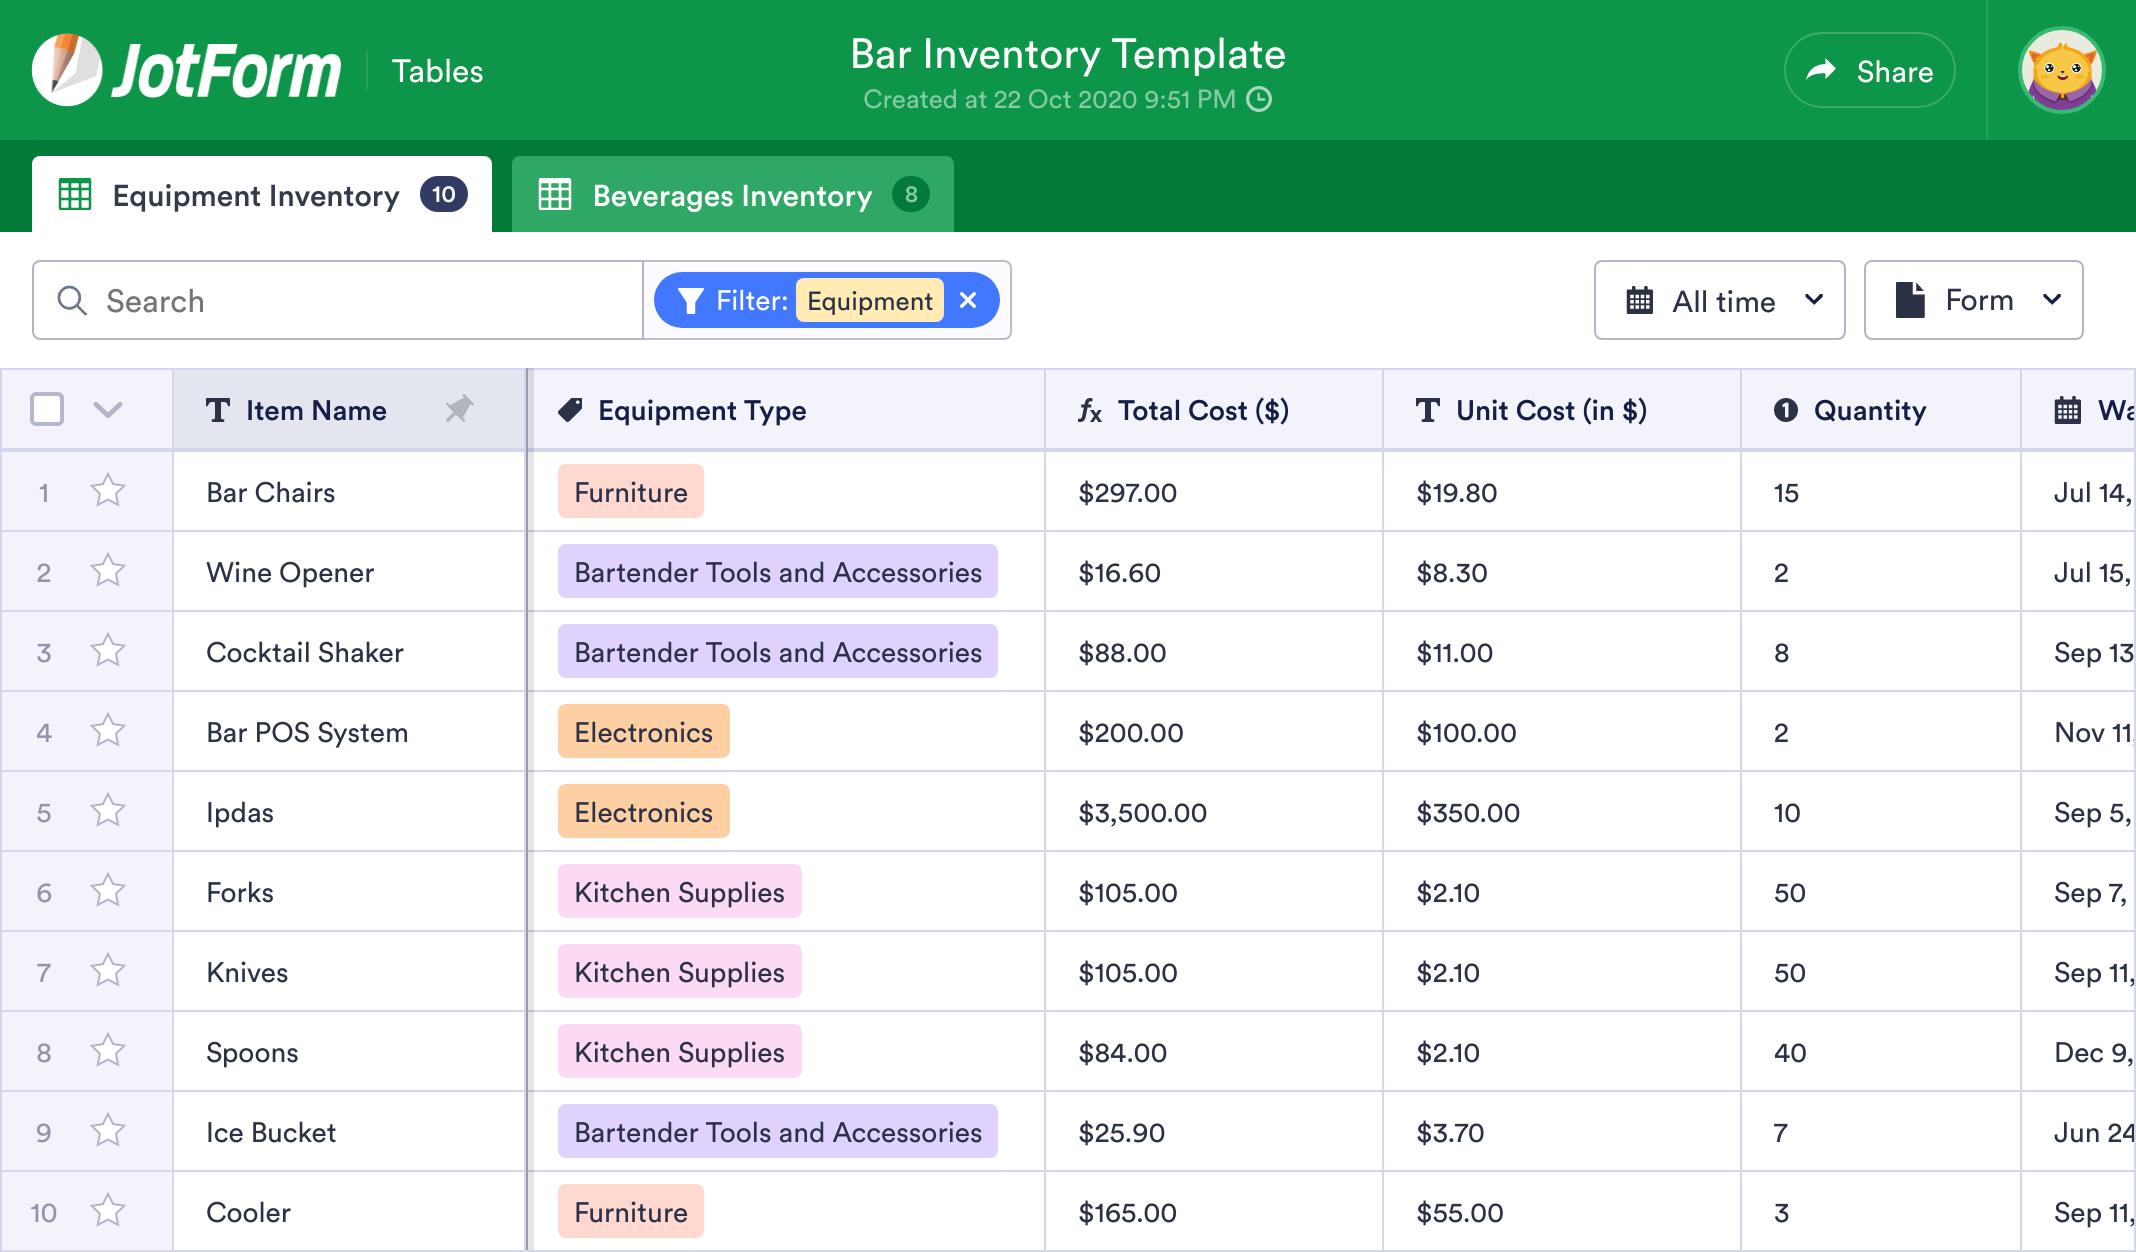 Bar Inventory Template